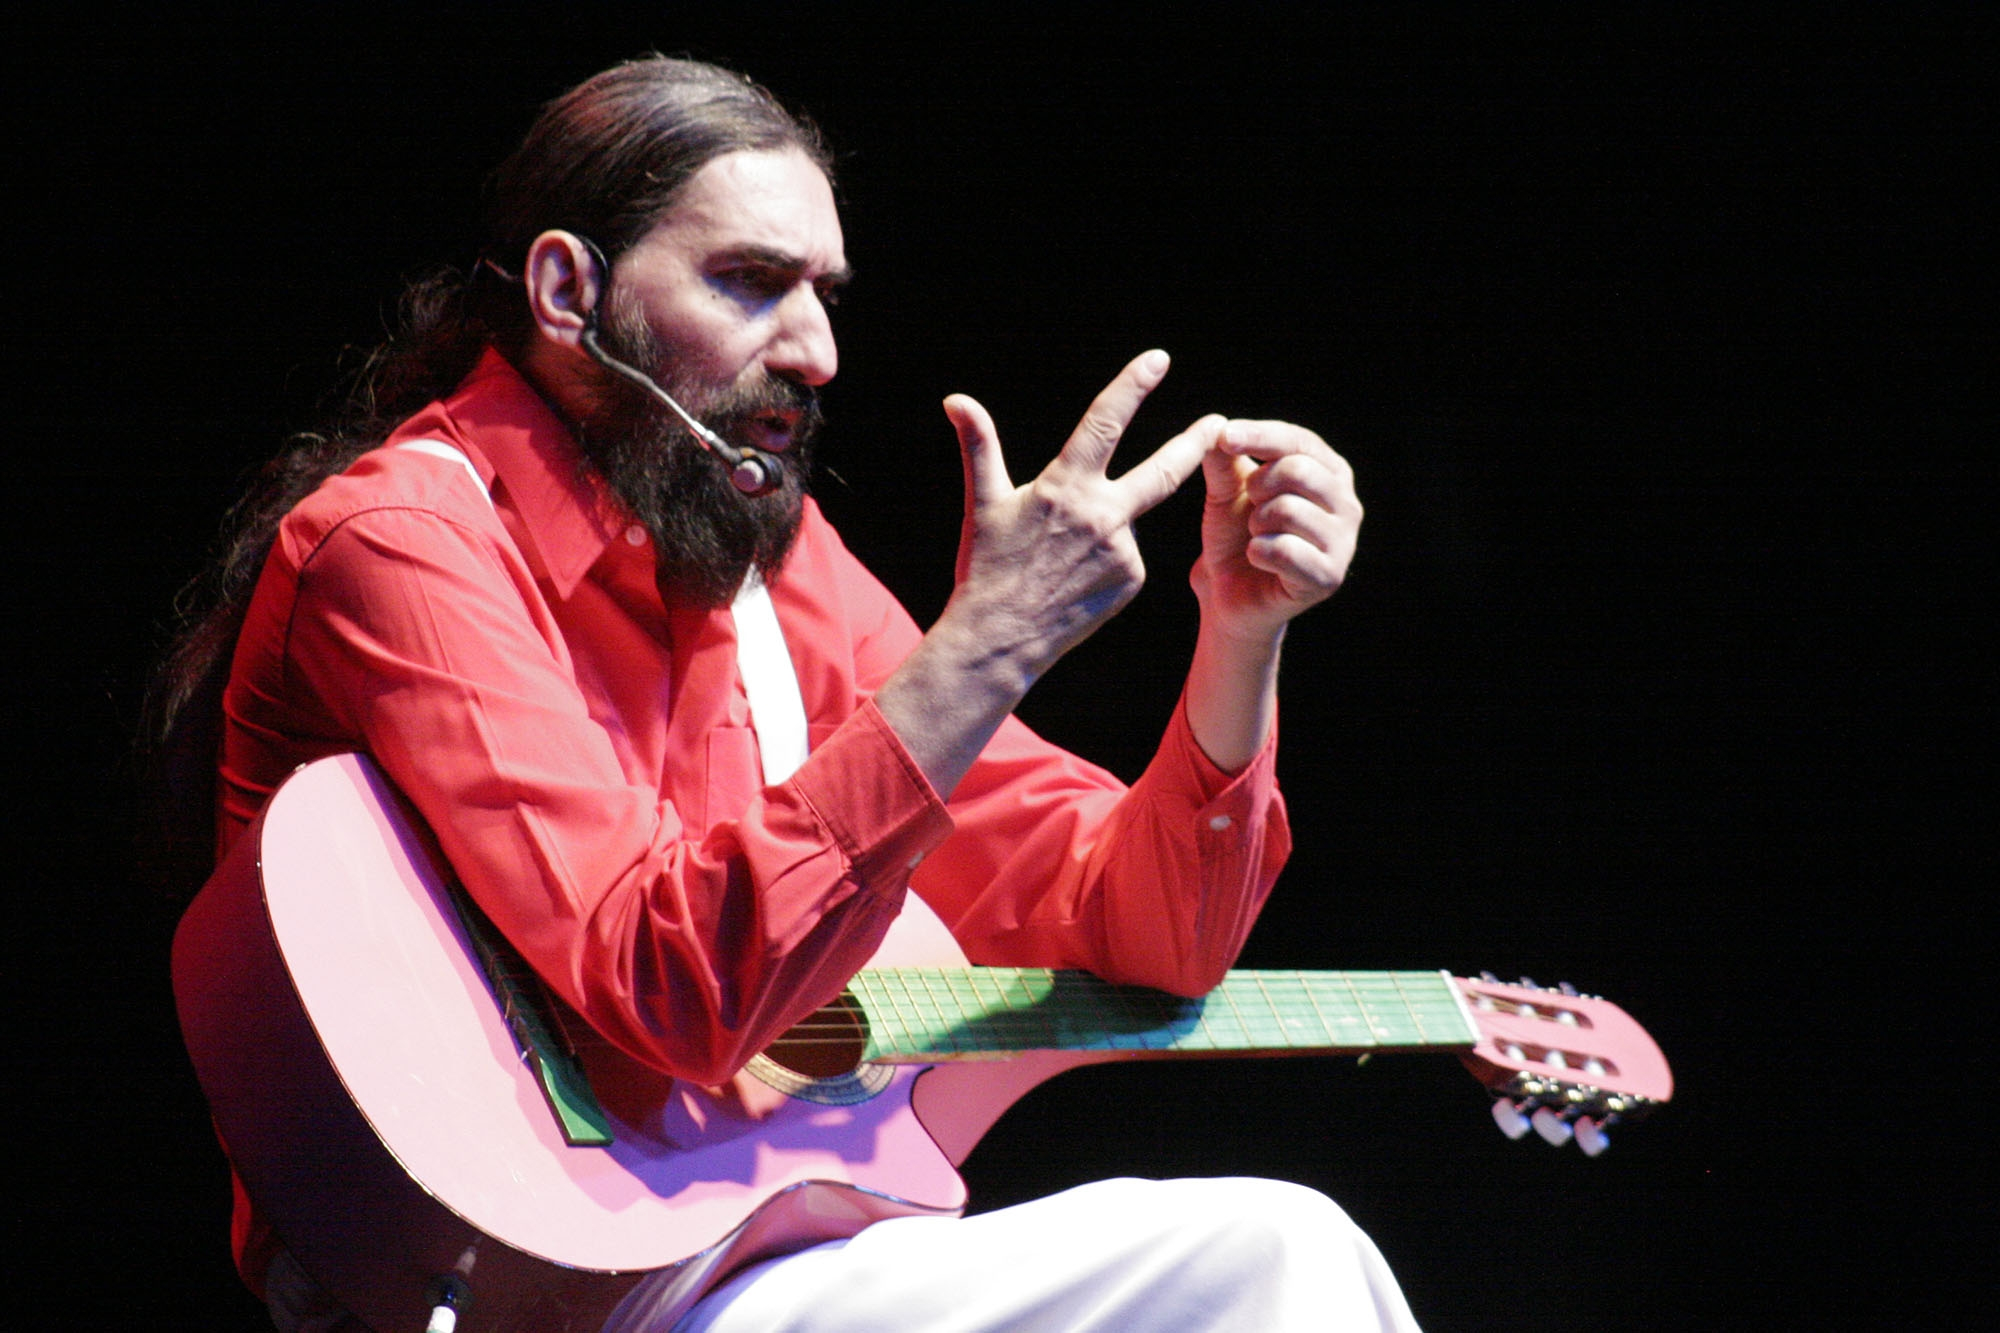 Hugo Varela trae su guitarra indomable